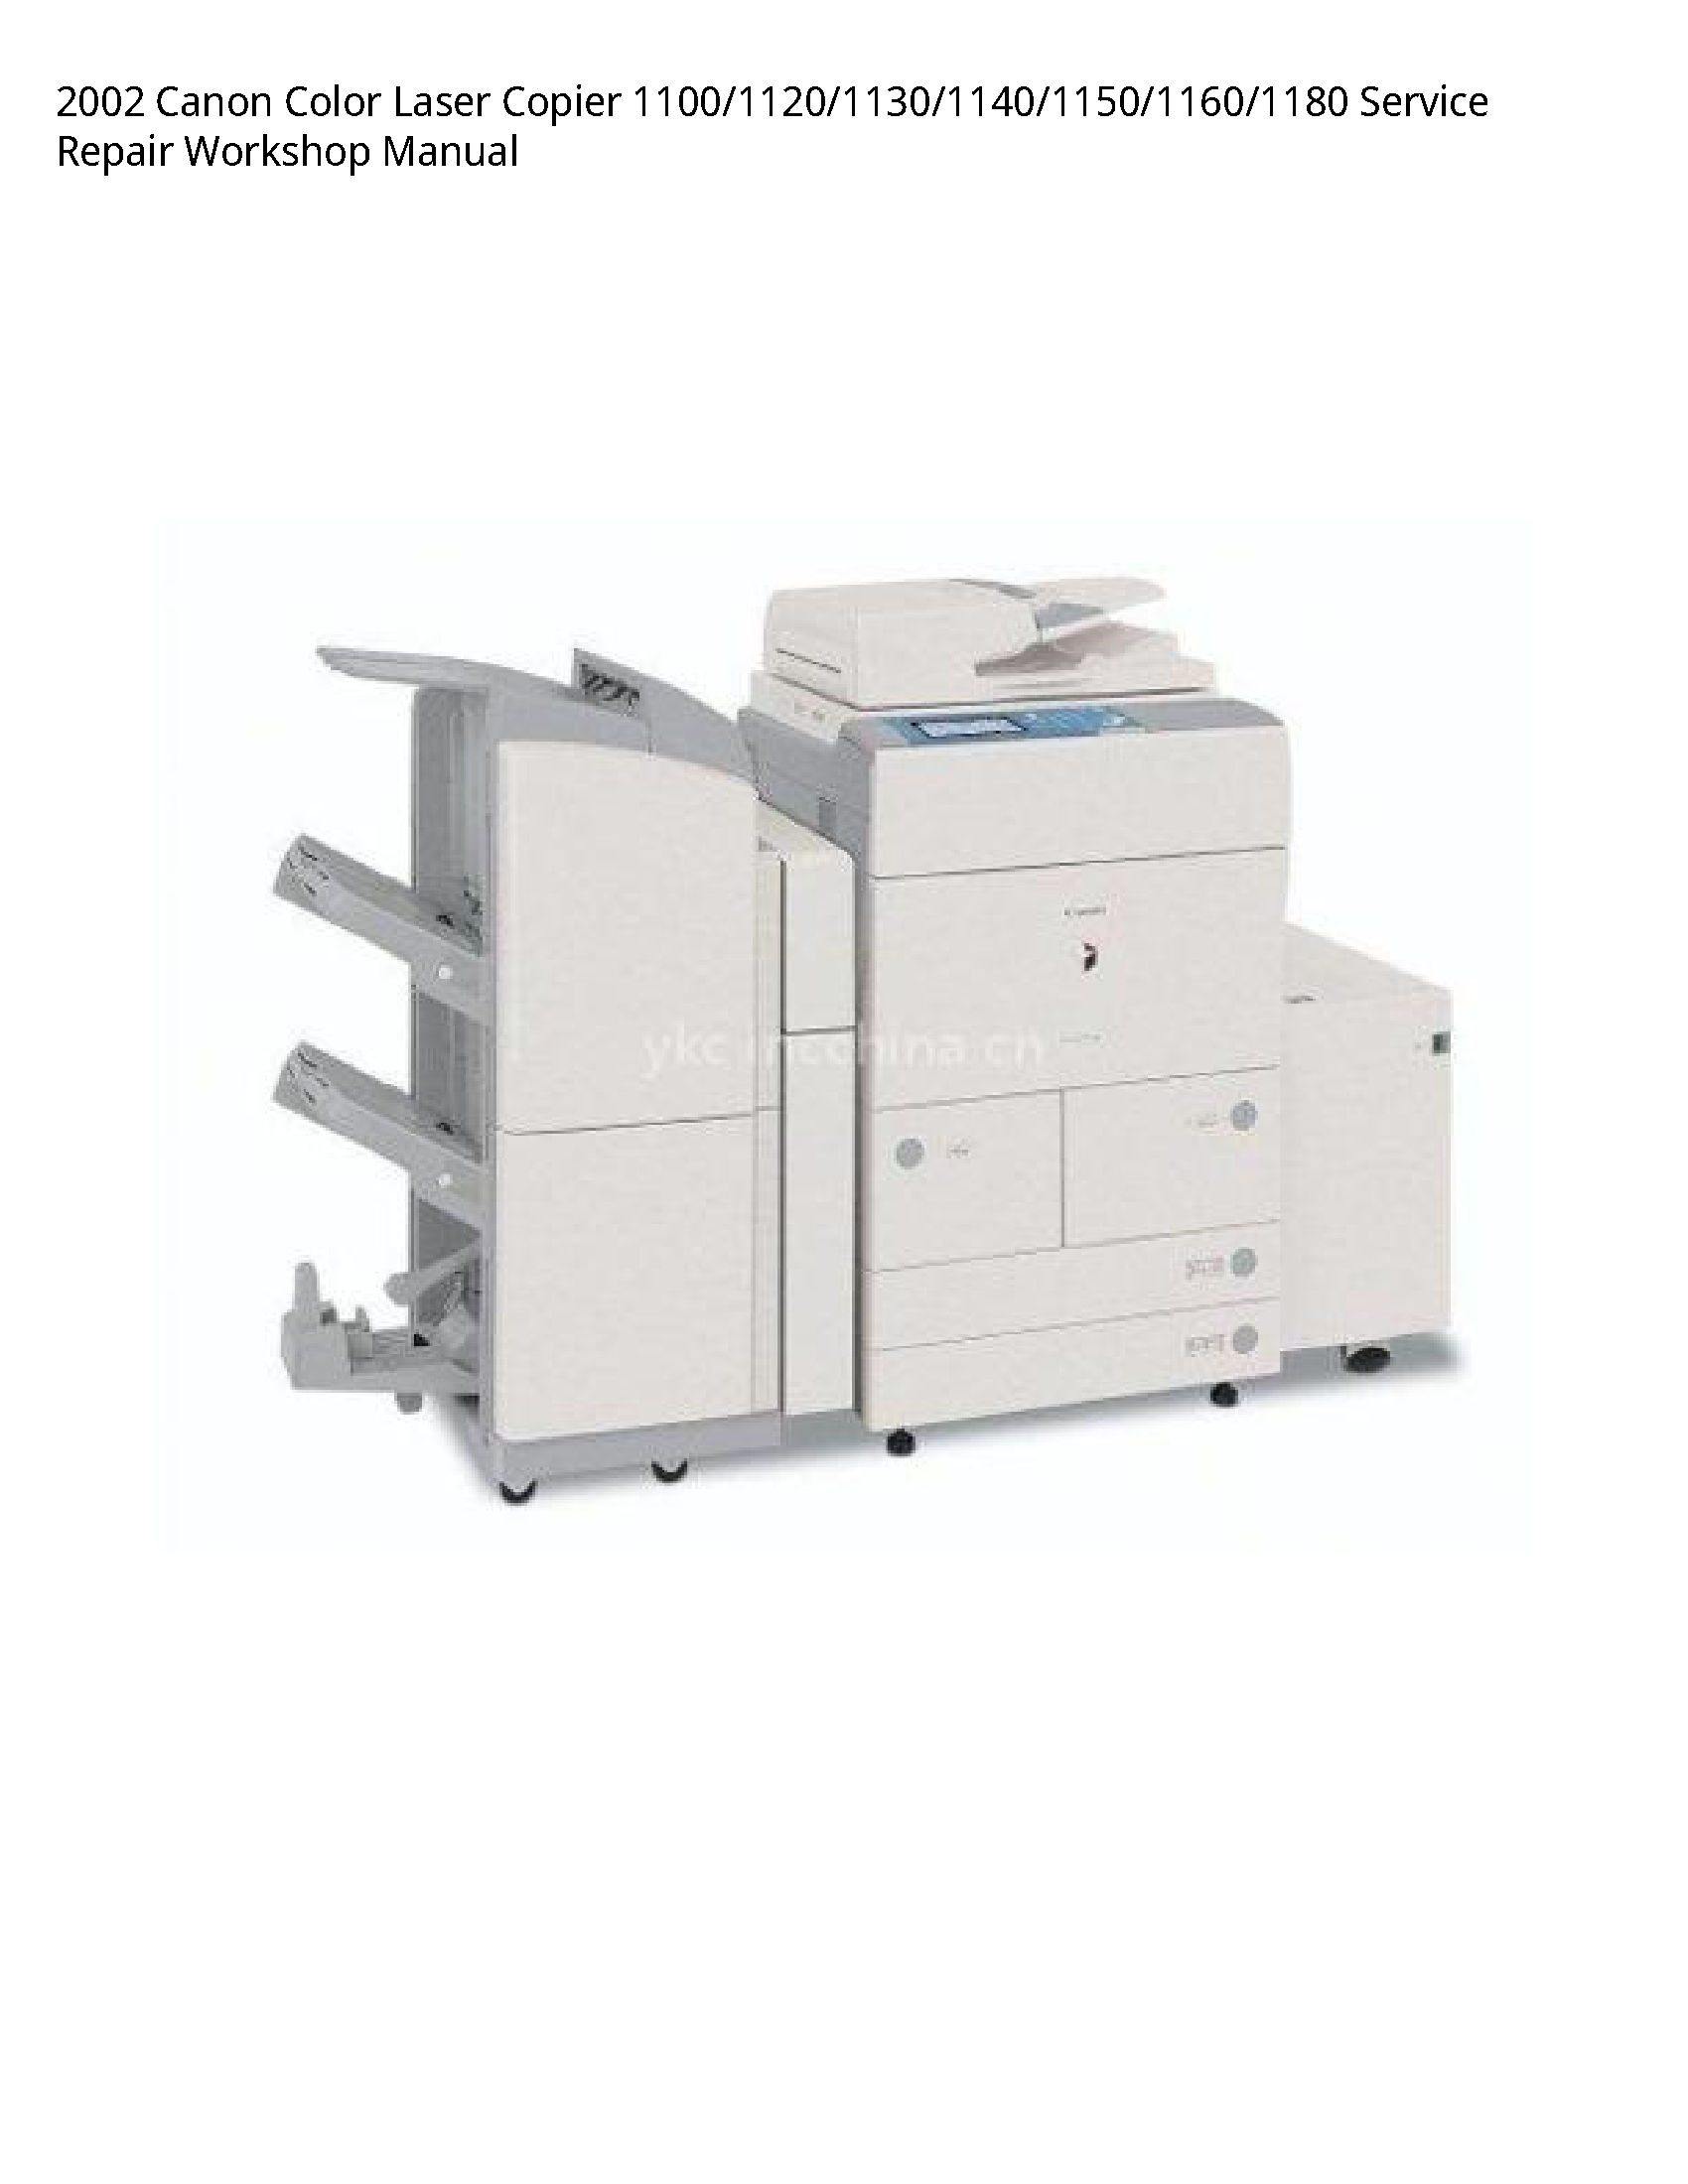 Canon 1100 Color Laser Copier manual